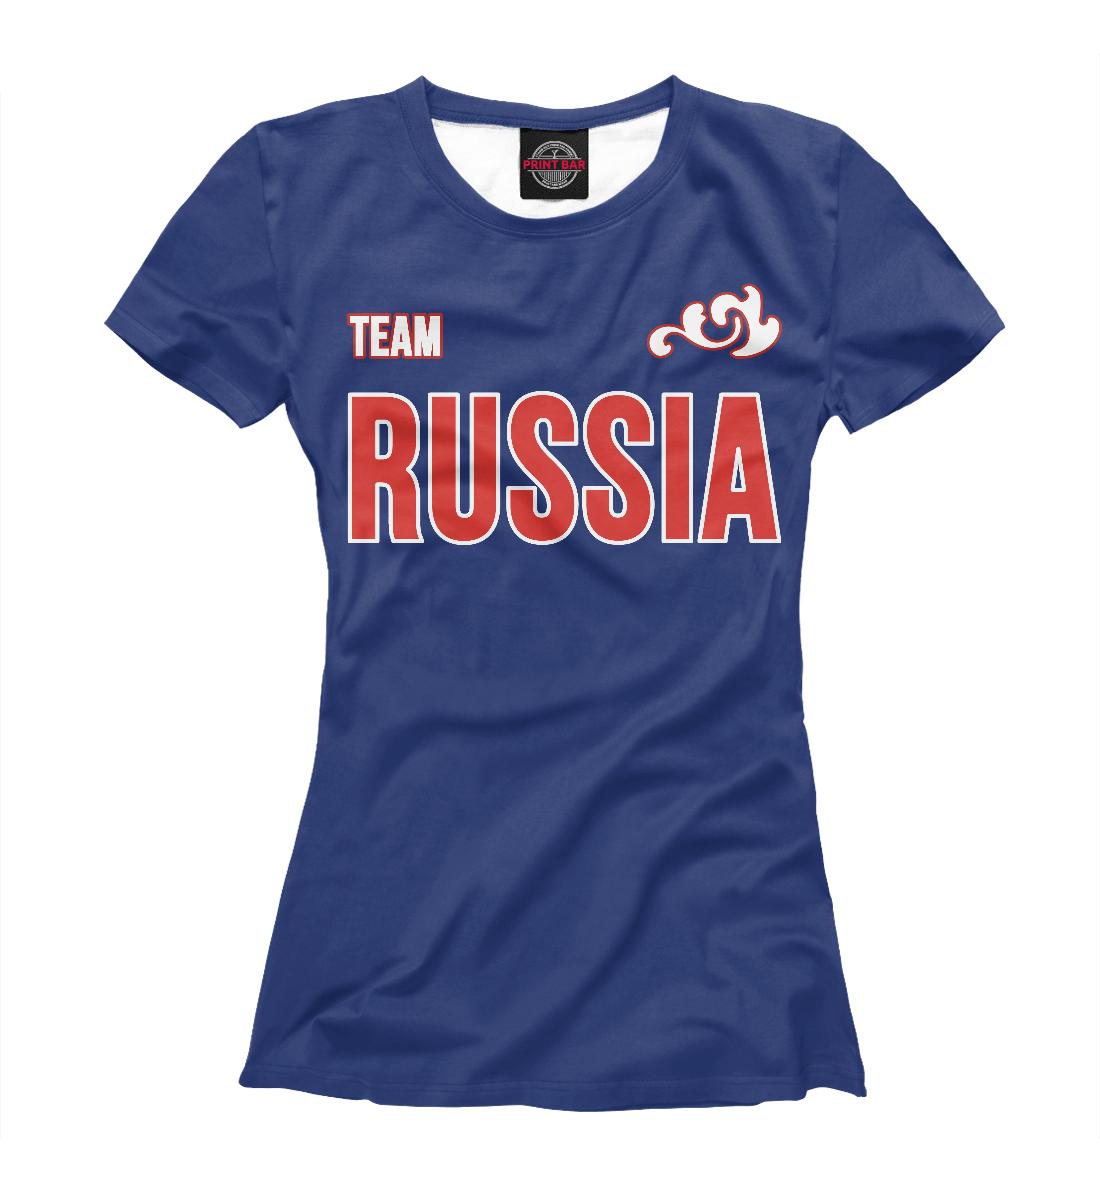 Купить Team Russia, Printbar, Футболки, VSY-729400-fut-1